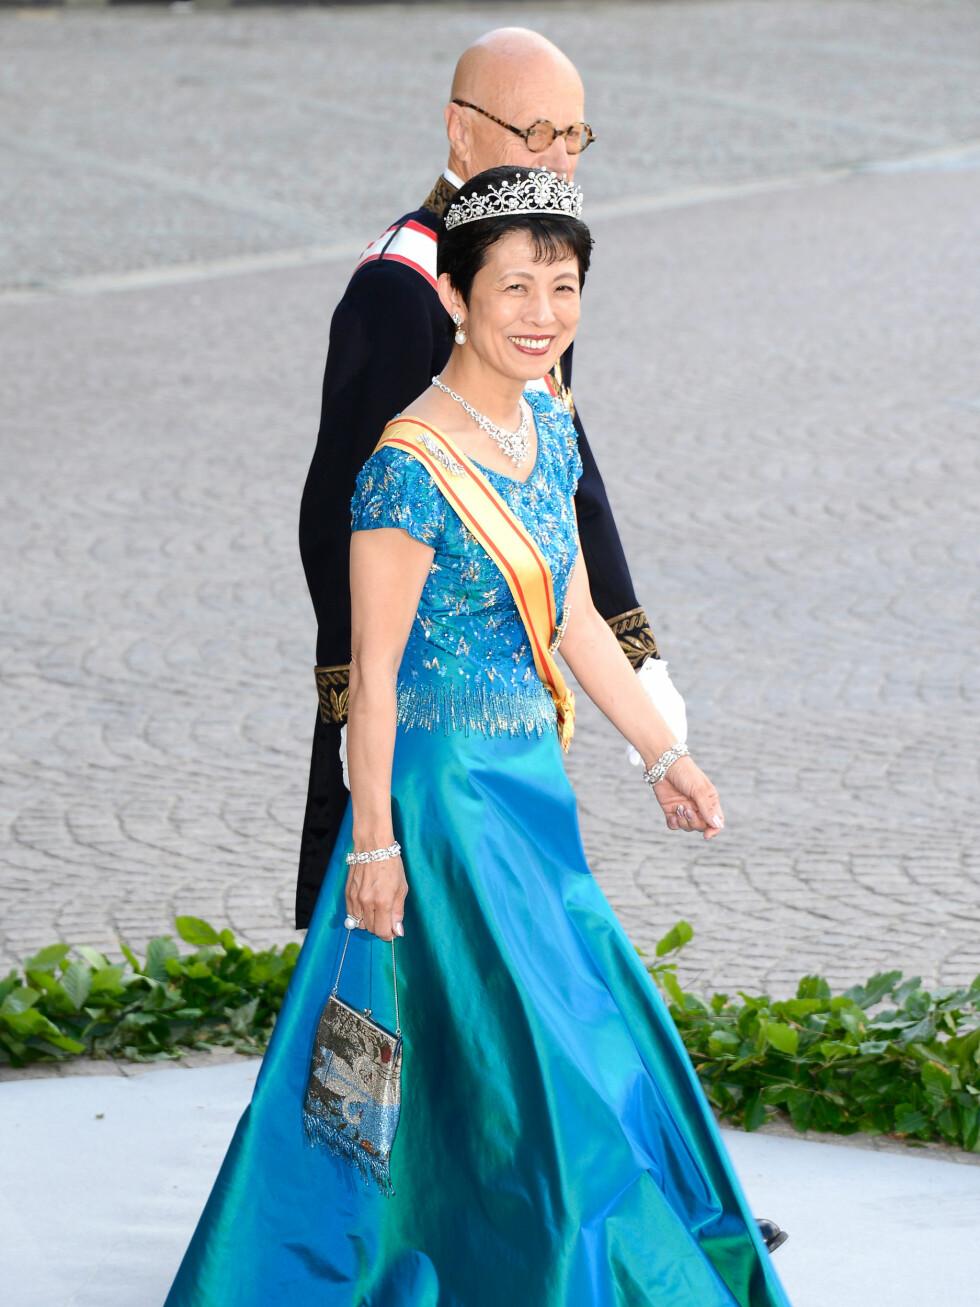 Prinsesse Takamado av Japan. Foto: All Over Press